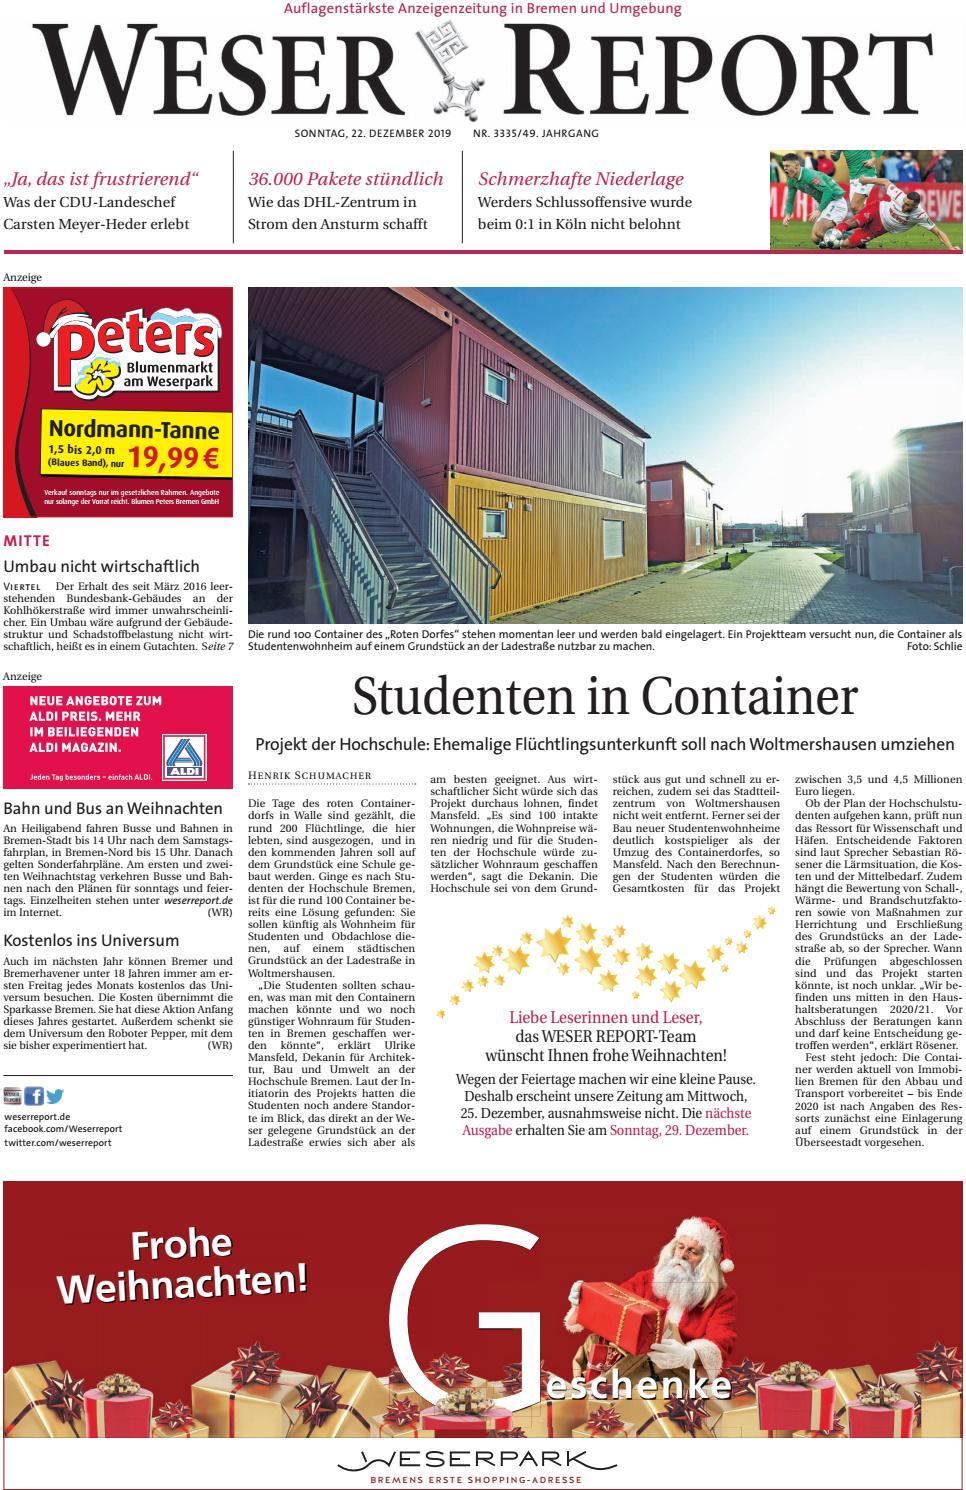 Weser Report Mitte vom 22.12.2019 by KPS